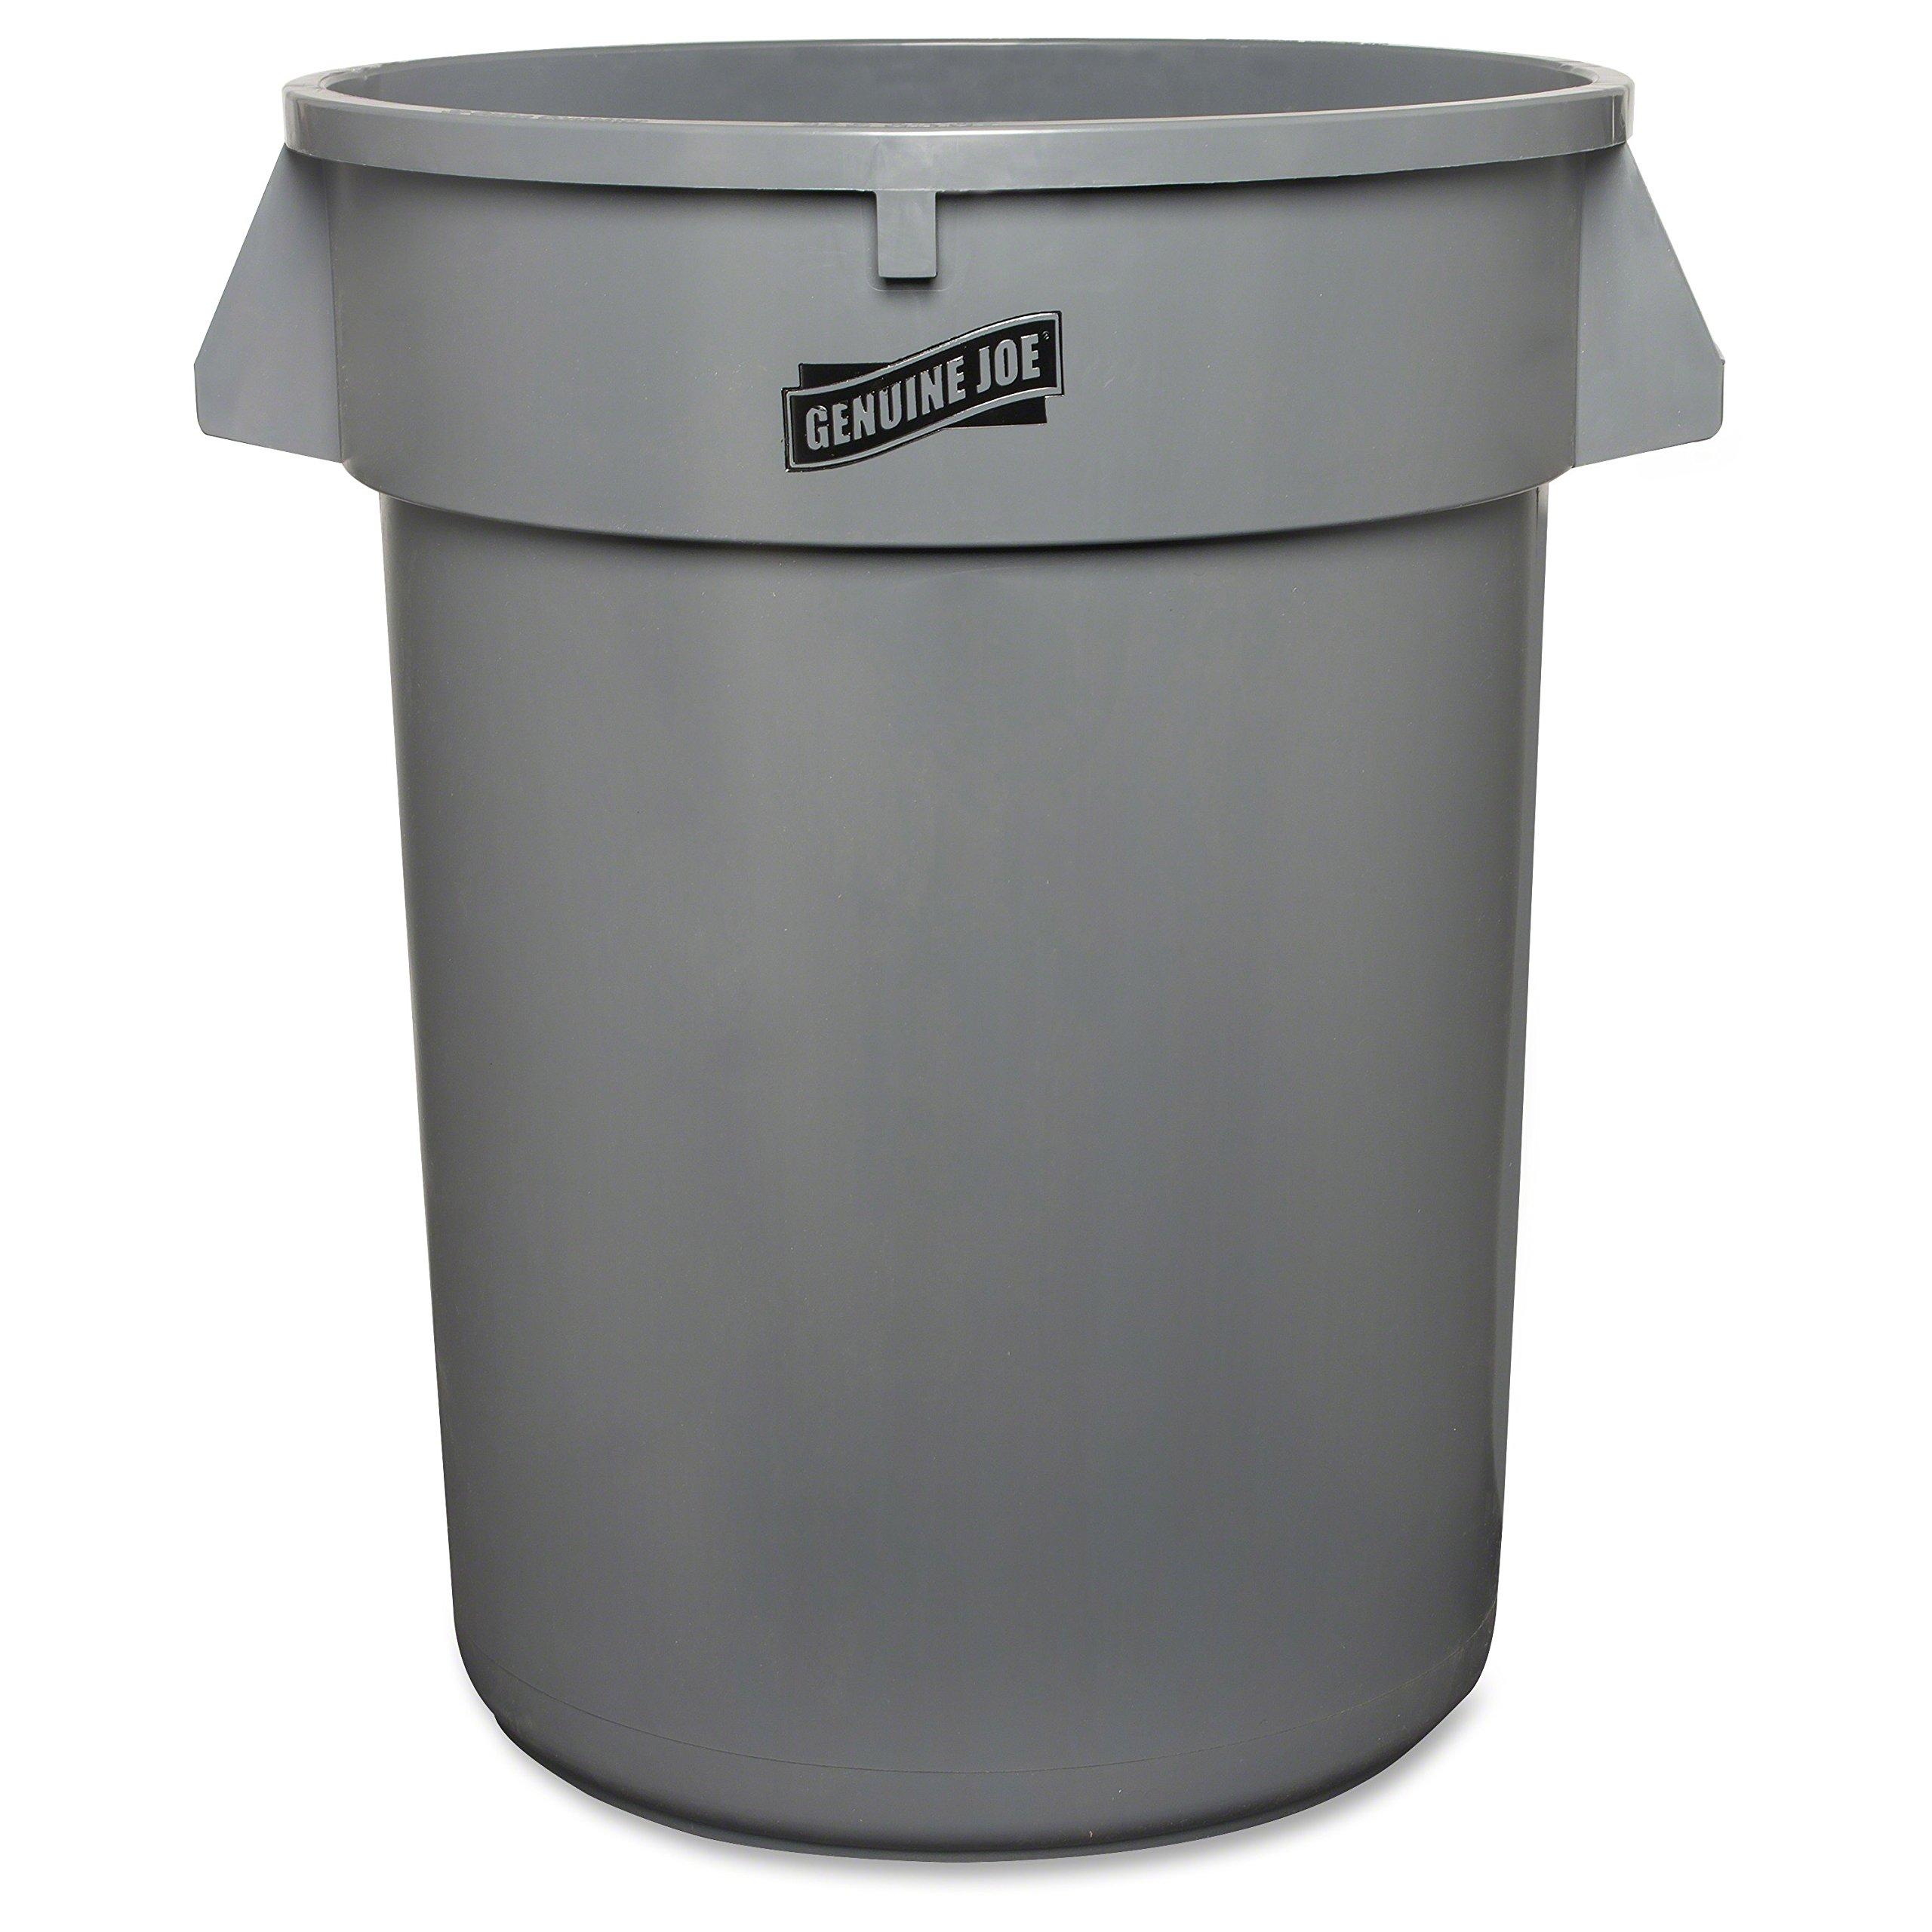 Genuine Joe GJO60463CT Heavy-Duty Trash Container, Plastic, 32 gal Capacity, Gray (Pack of 6)